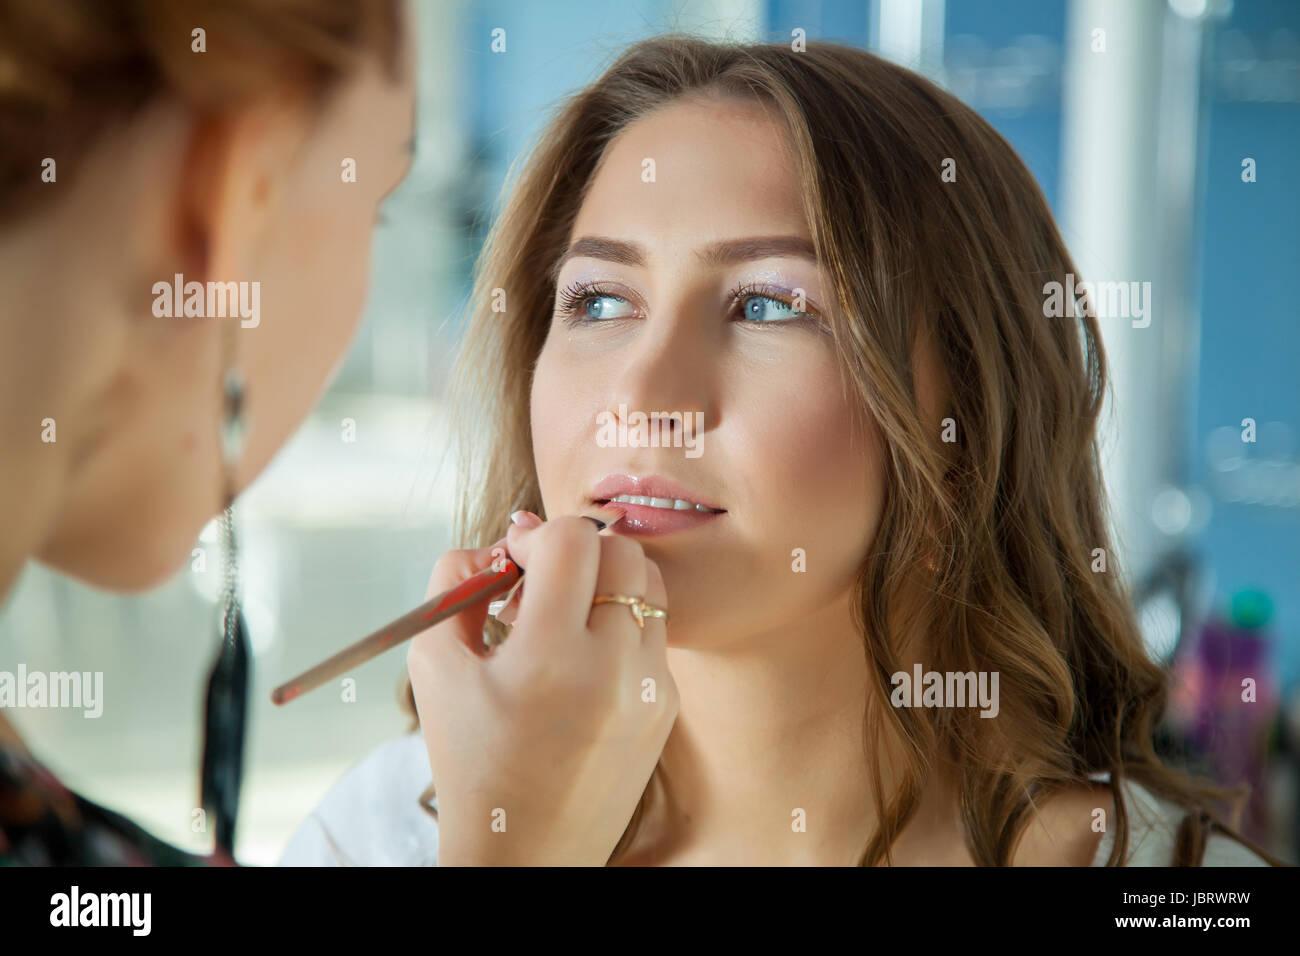 Maquillaje artista haciendo maquillaje profesional de joven Foto de stock